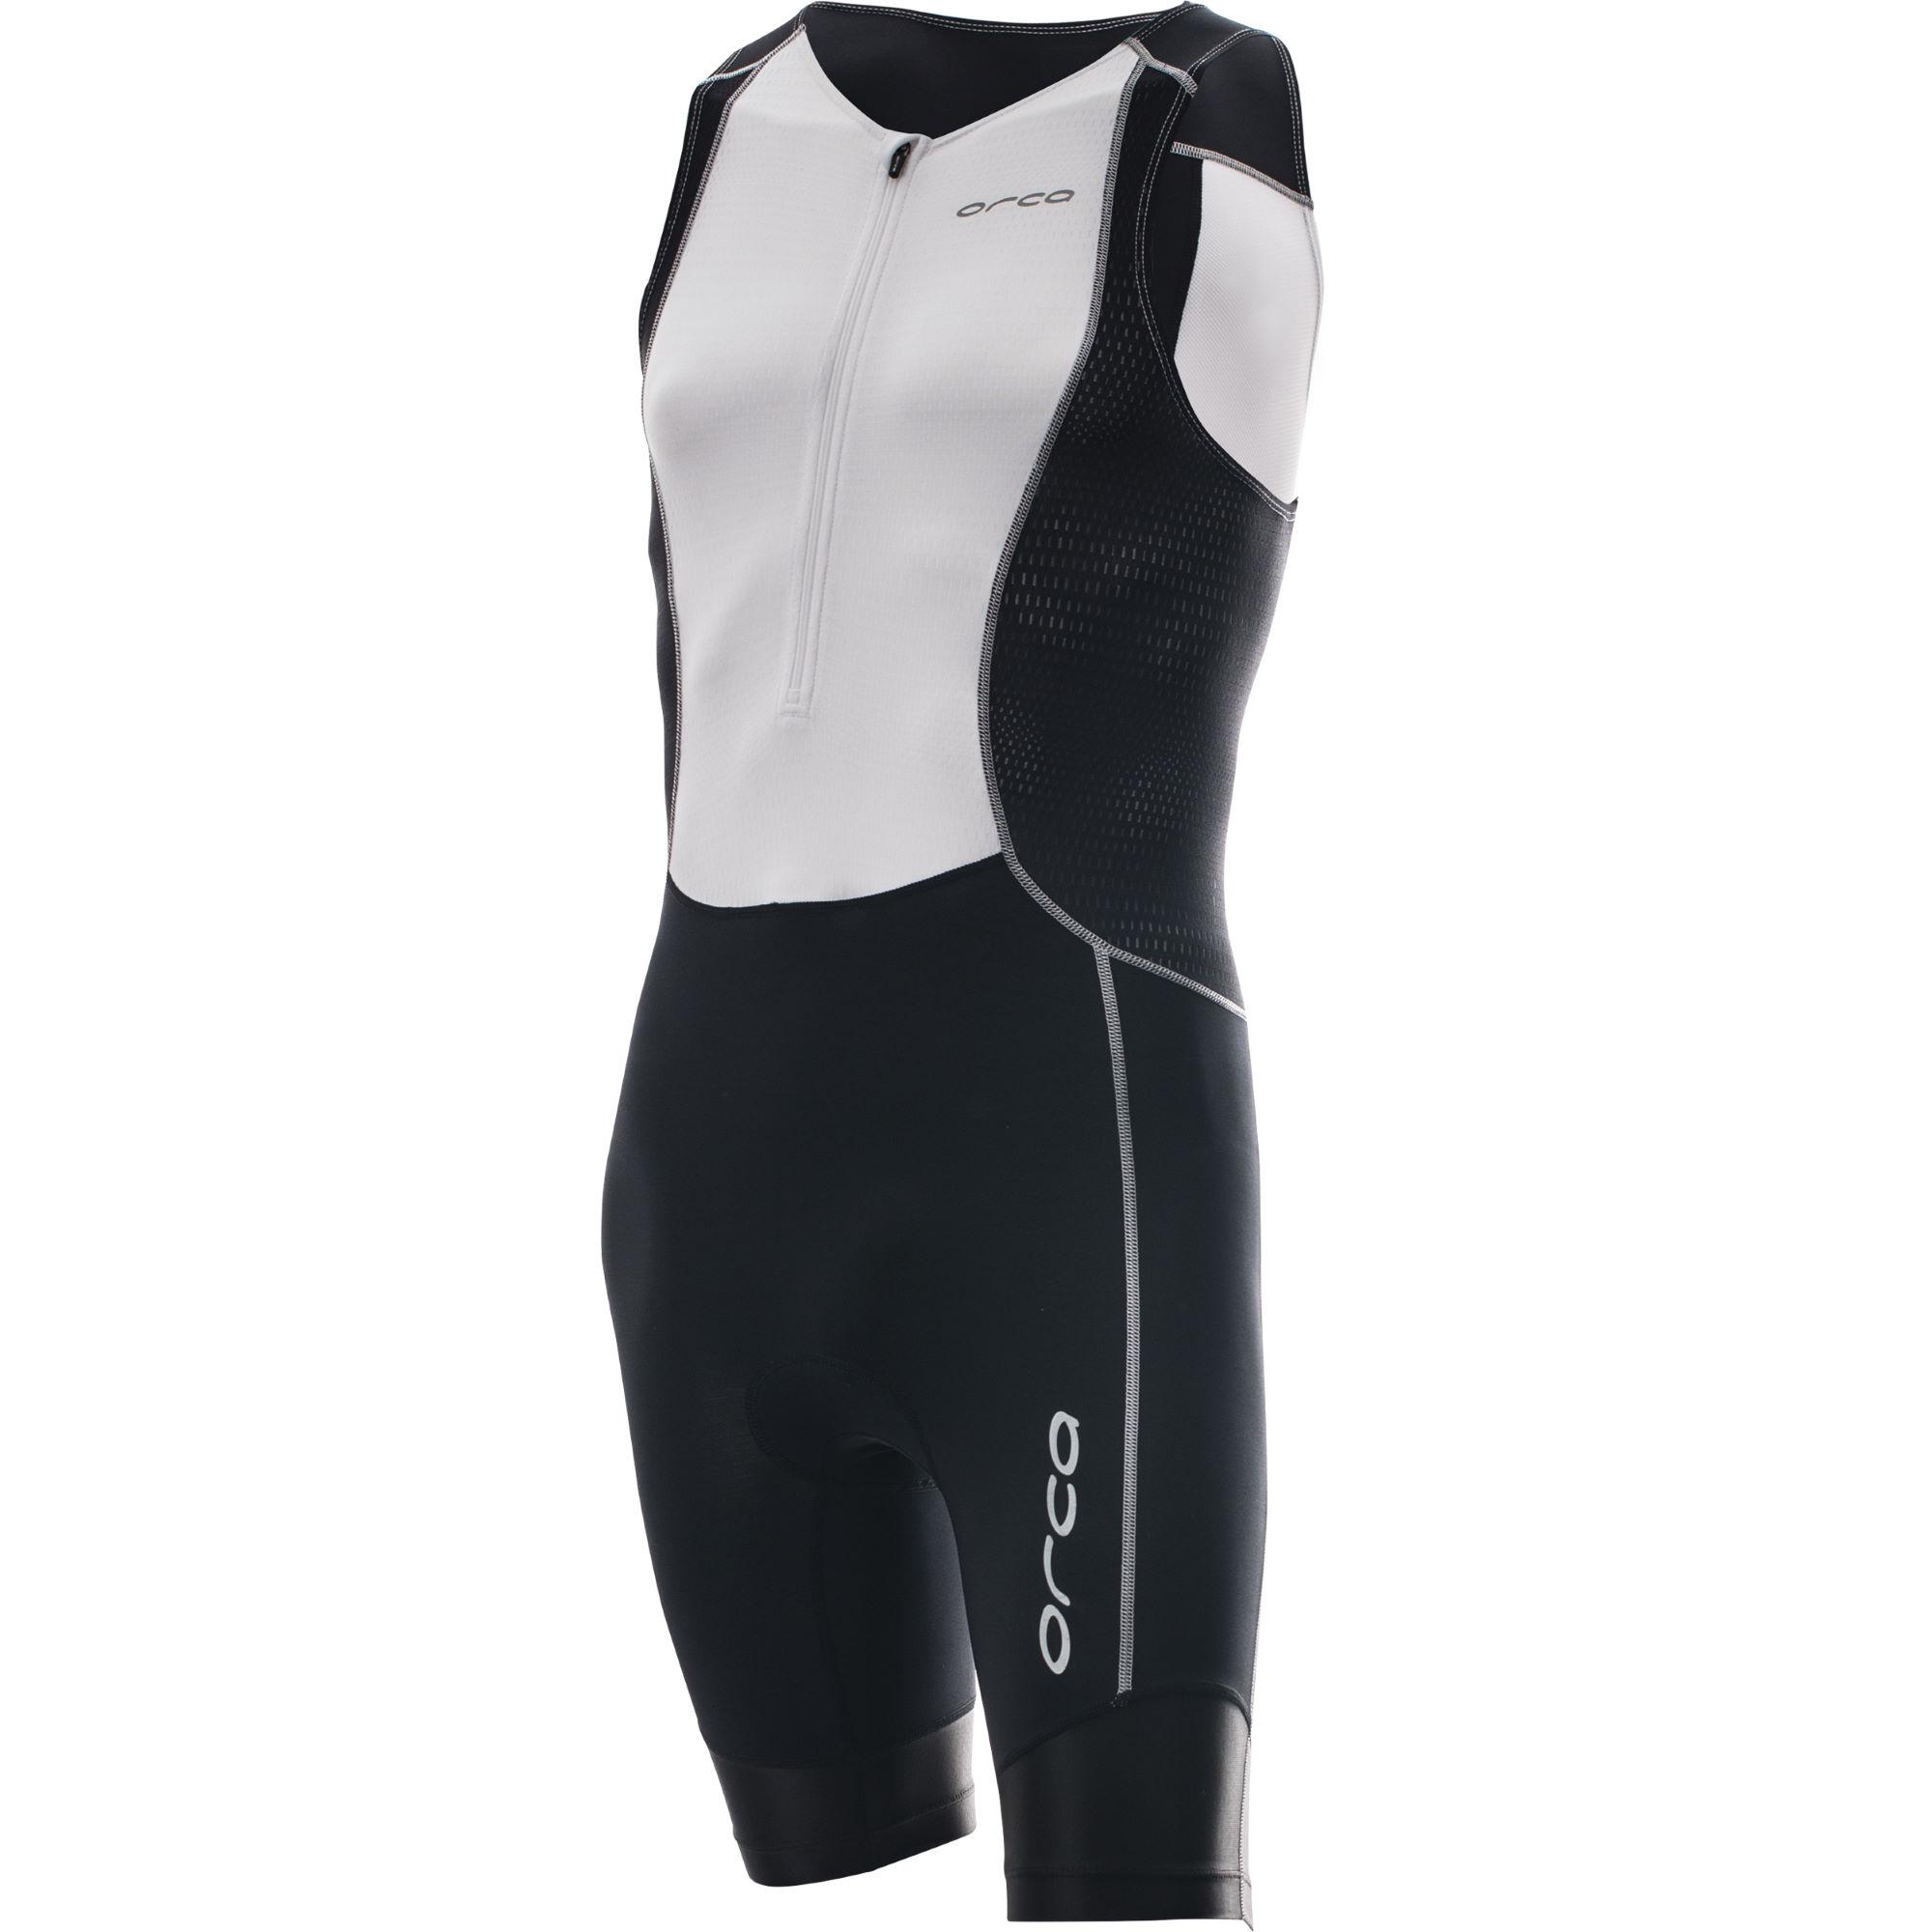 15ee6520a Wolff-Wear - Orca 226 compression Race suit - 2016 (size S)